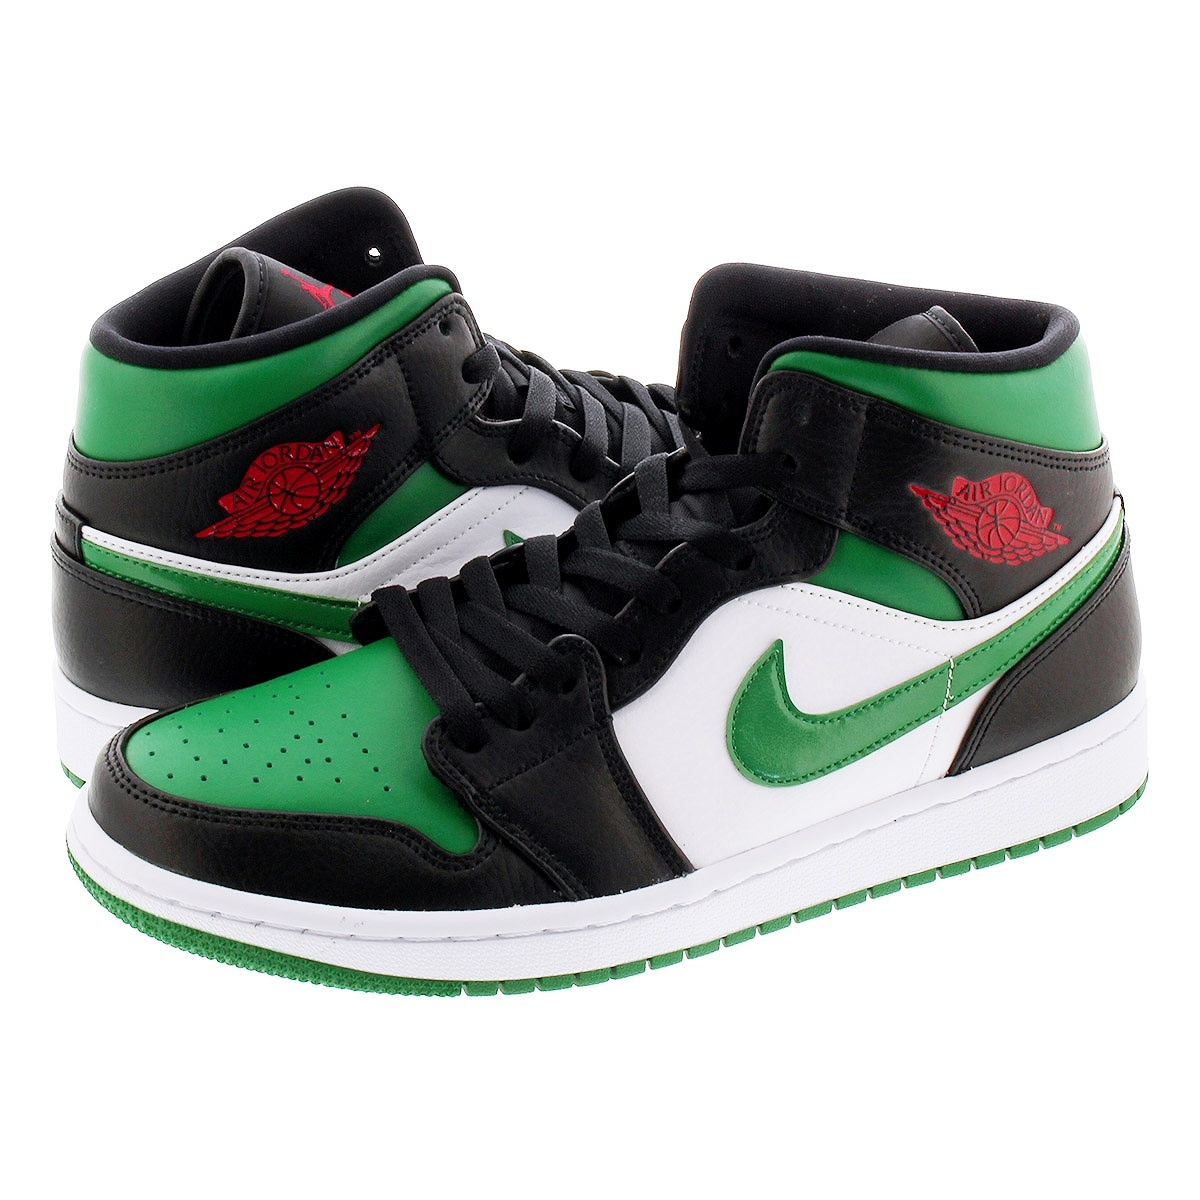 NIKE AIR JORDAN 1 MID ナイキ エア ジョーダン 1 ミッド BLACK/PINE GREEN/WHITE/GYM RED 554724-067